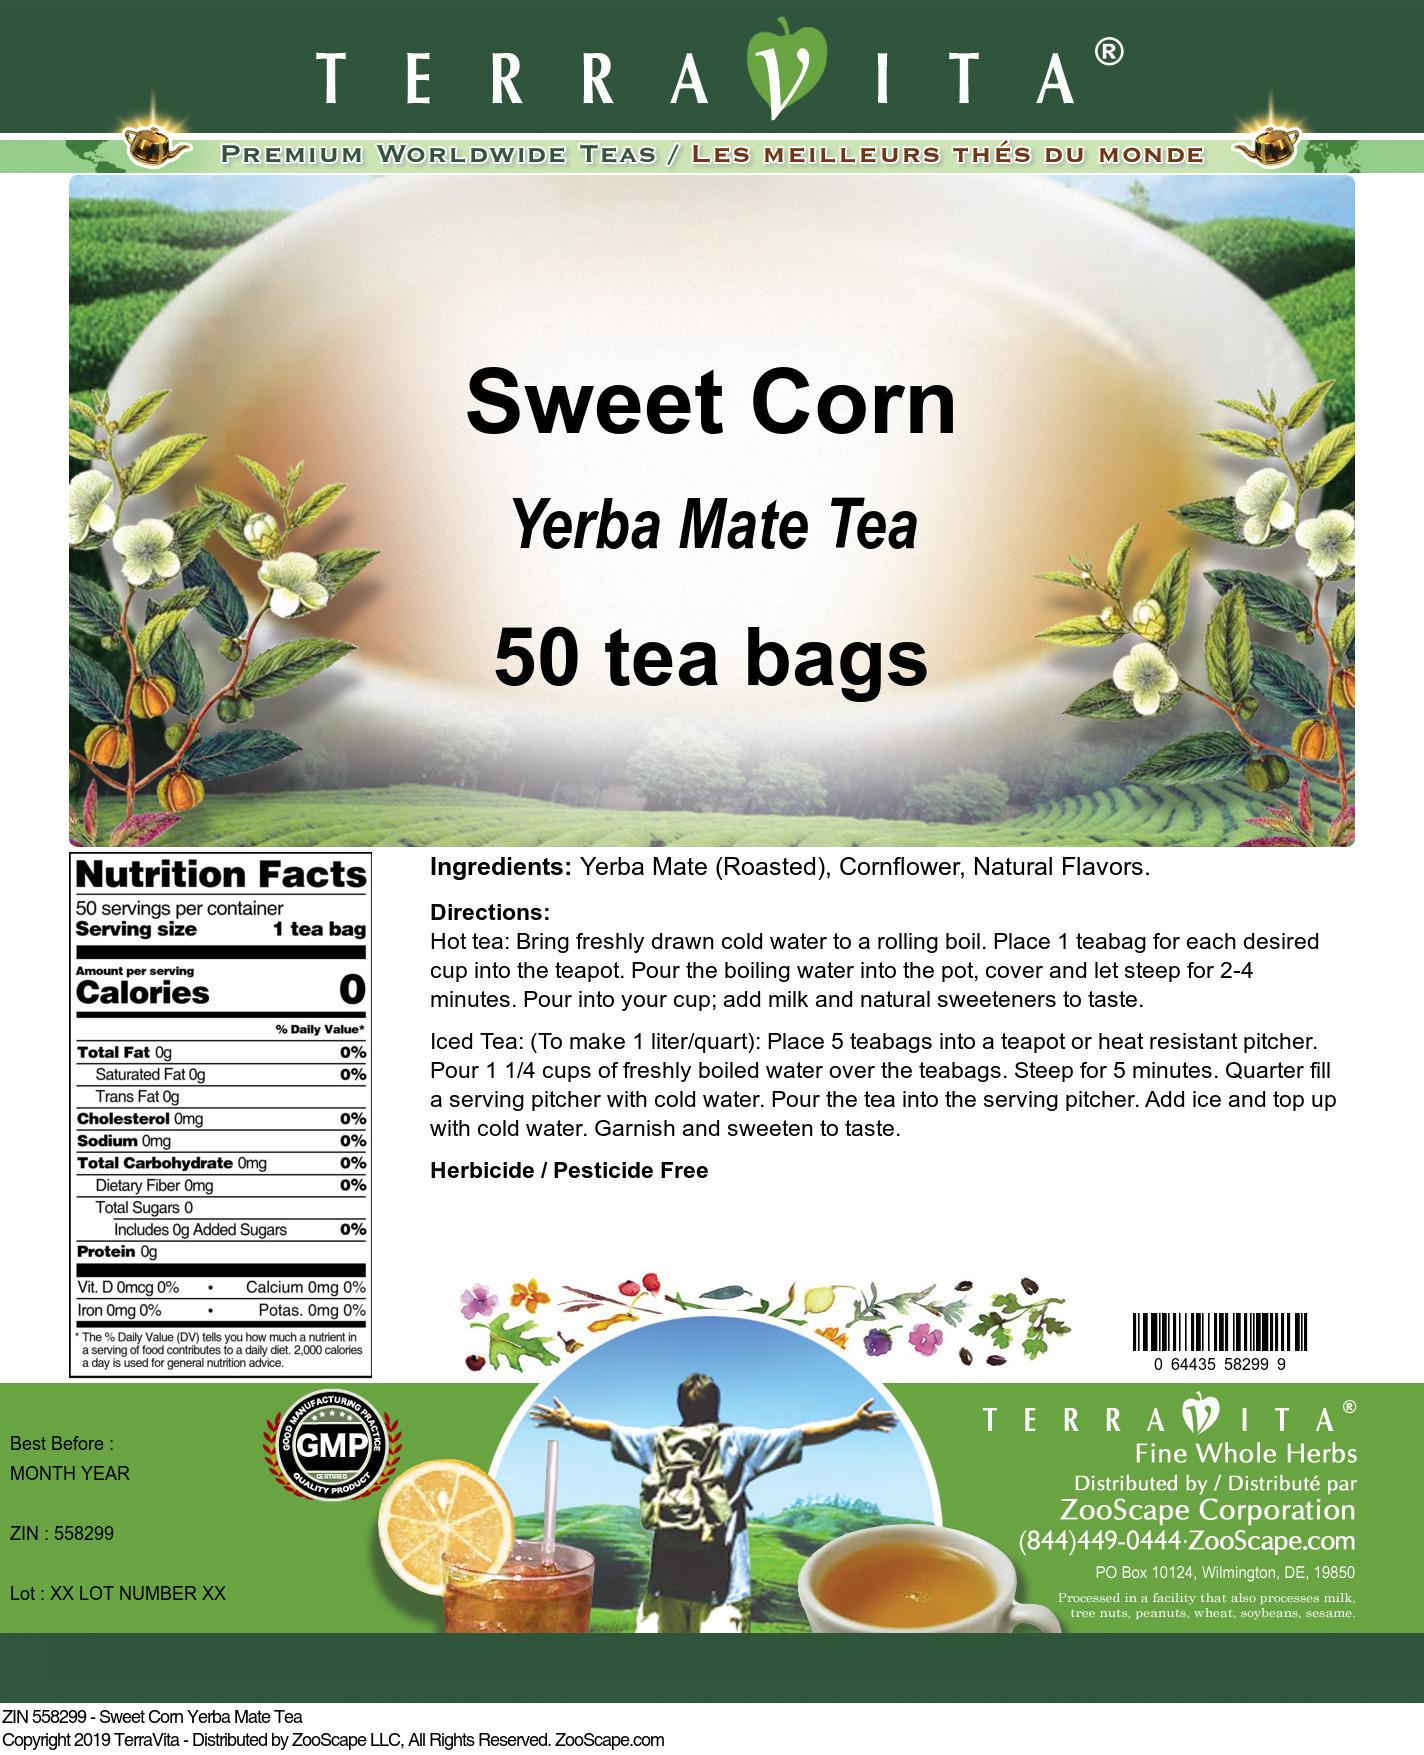 Sweet Corn Yerba Mate Tea